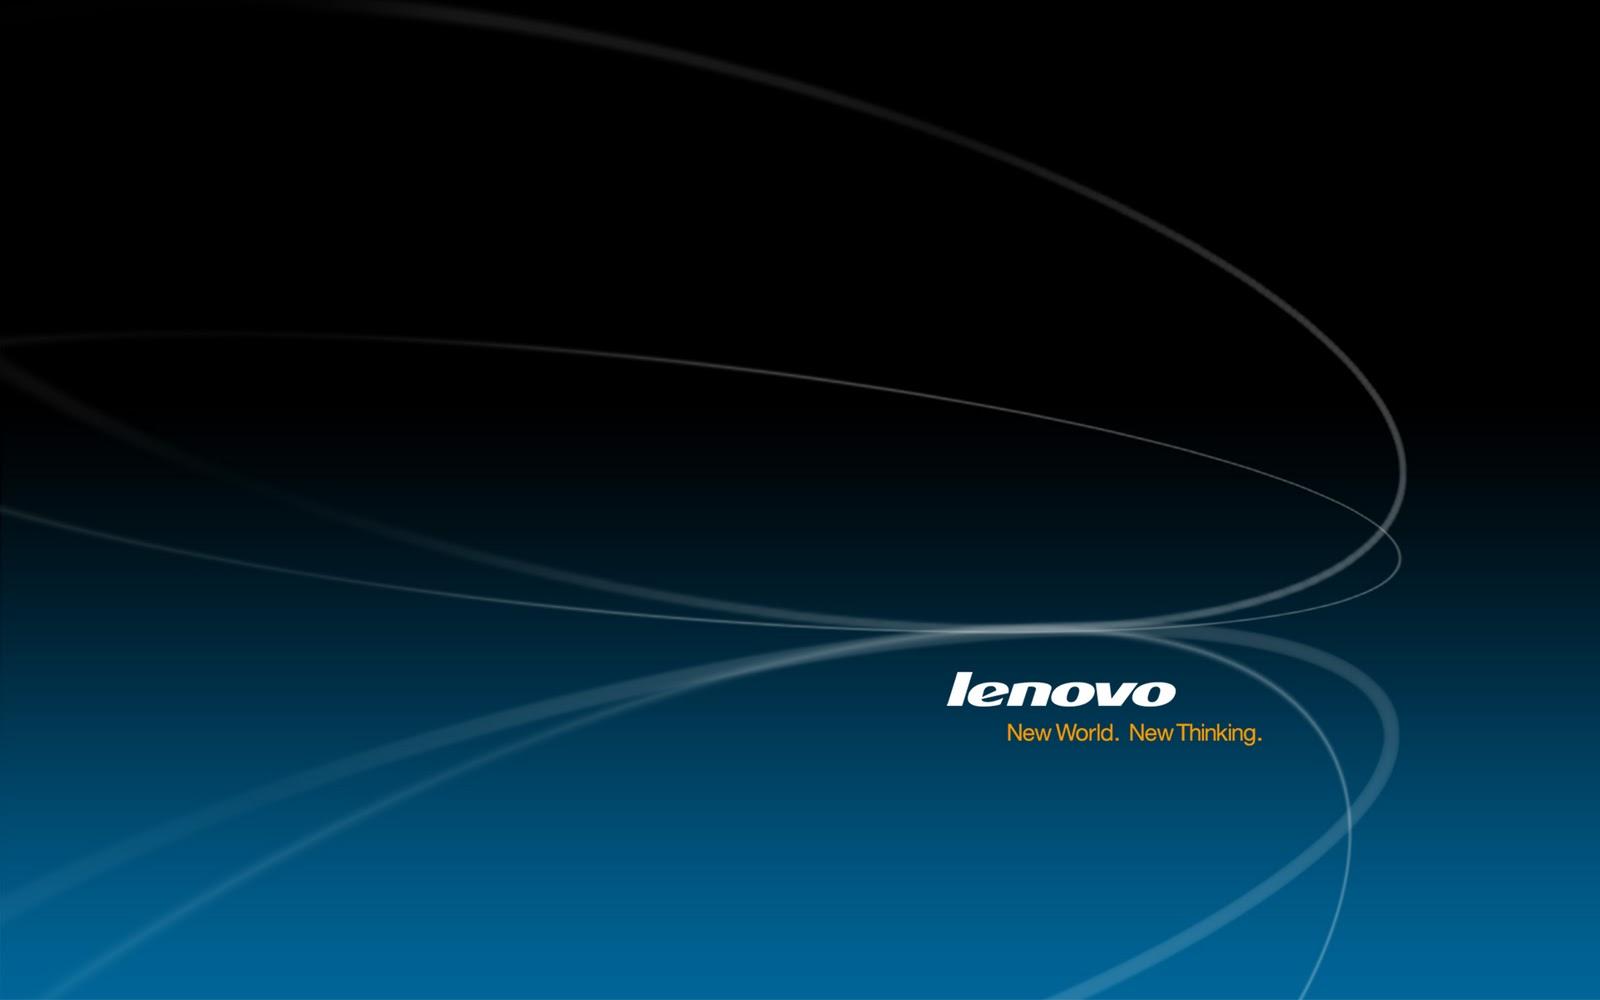 Lenovo Hd Wallpaper: My Today In My Beautiful Life: IBM Lenovo Thinkpad HD